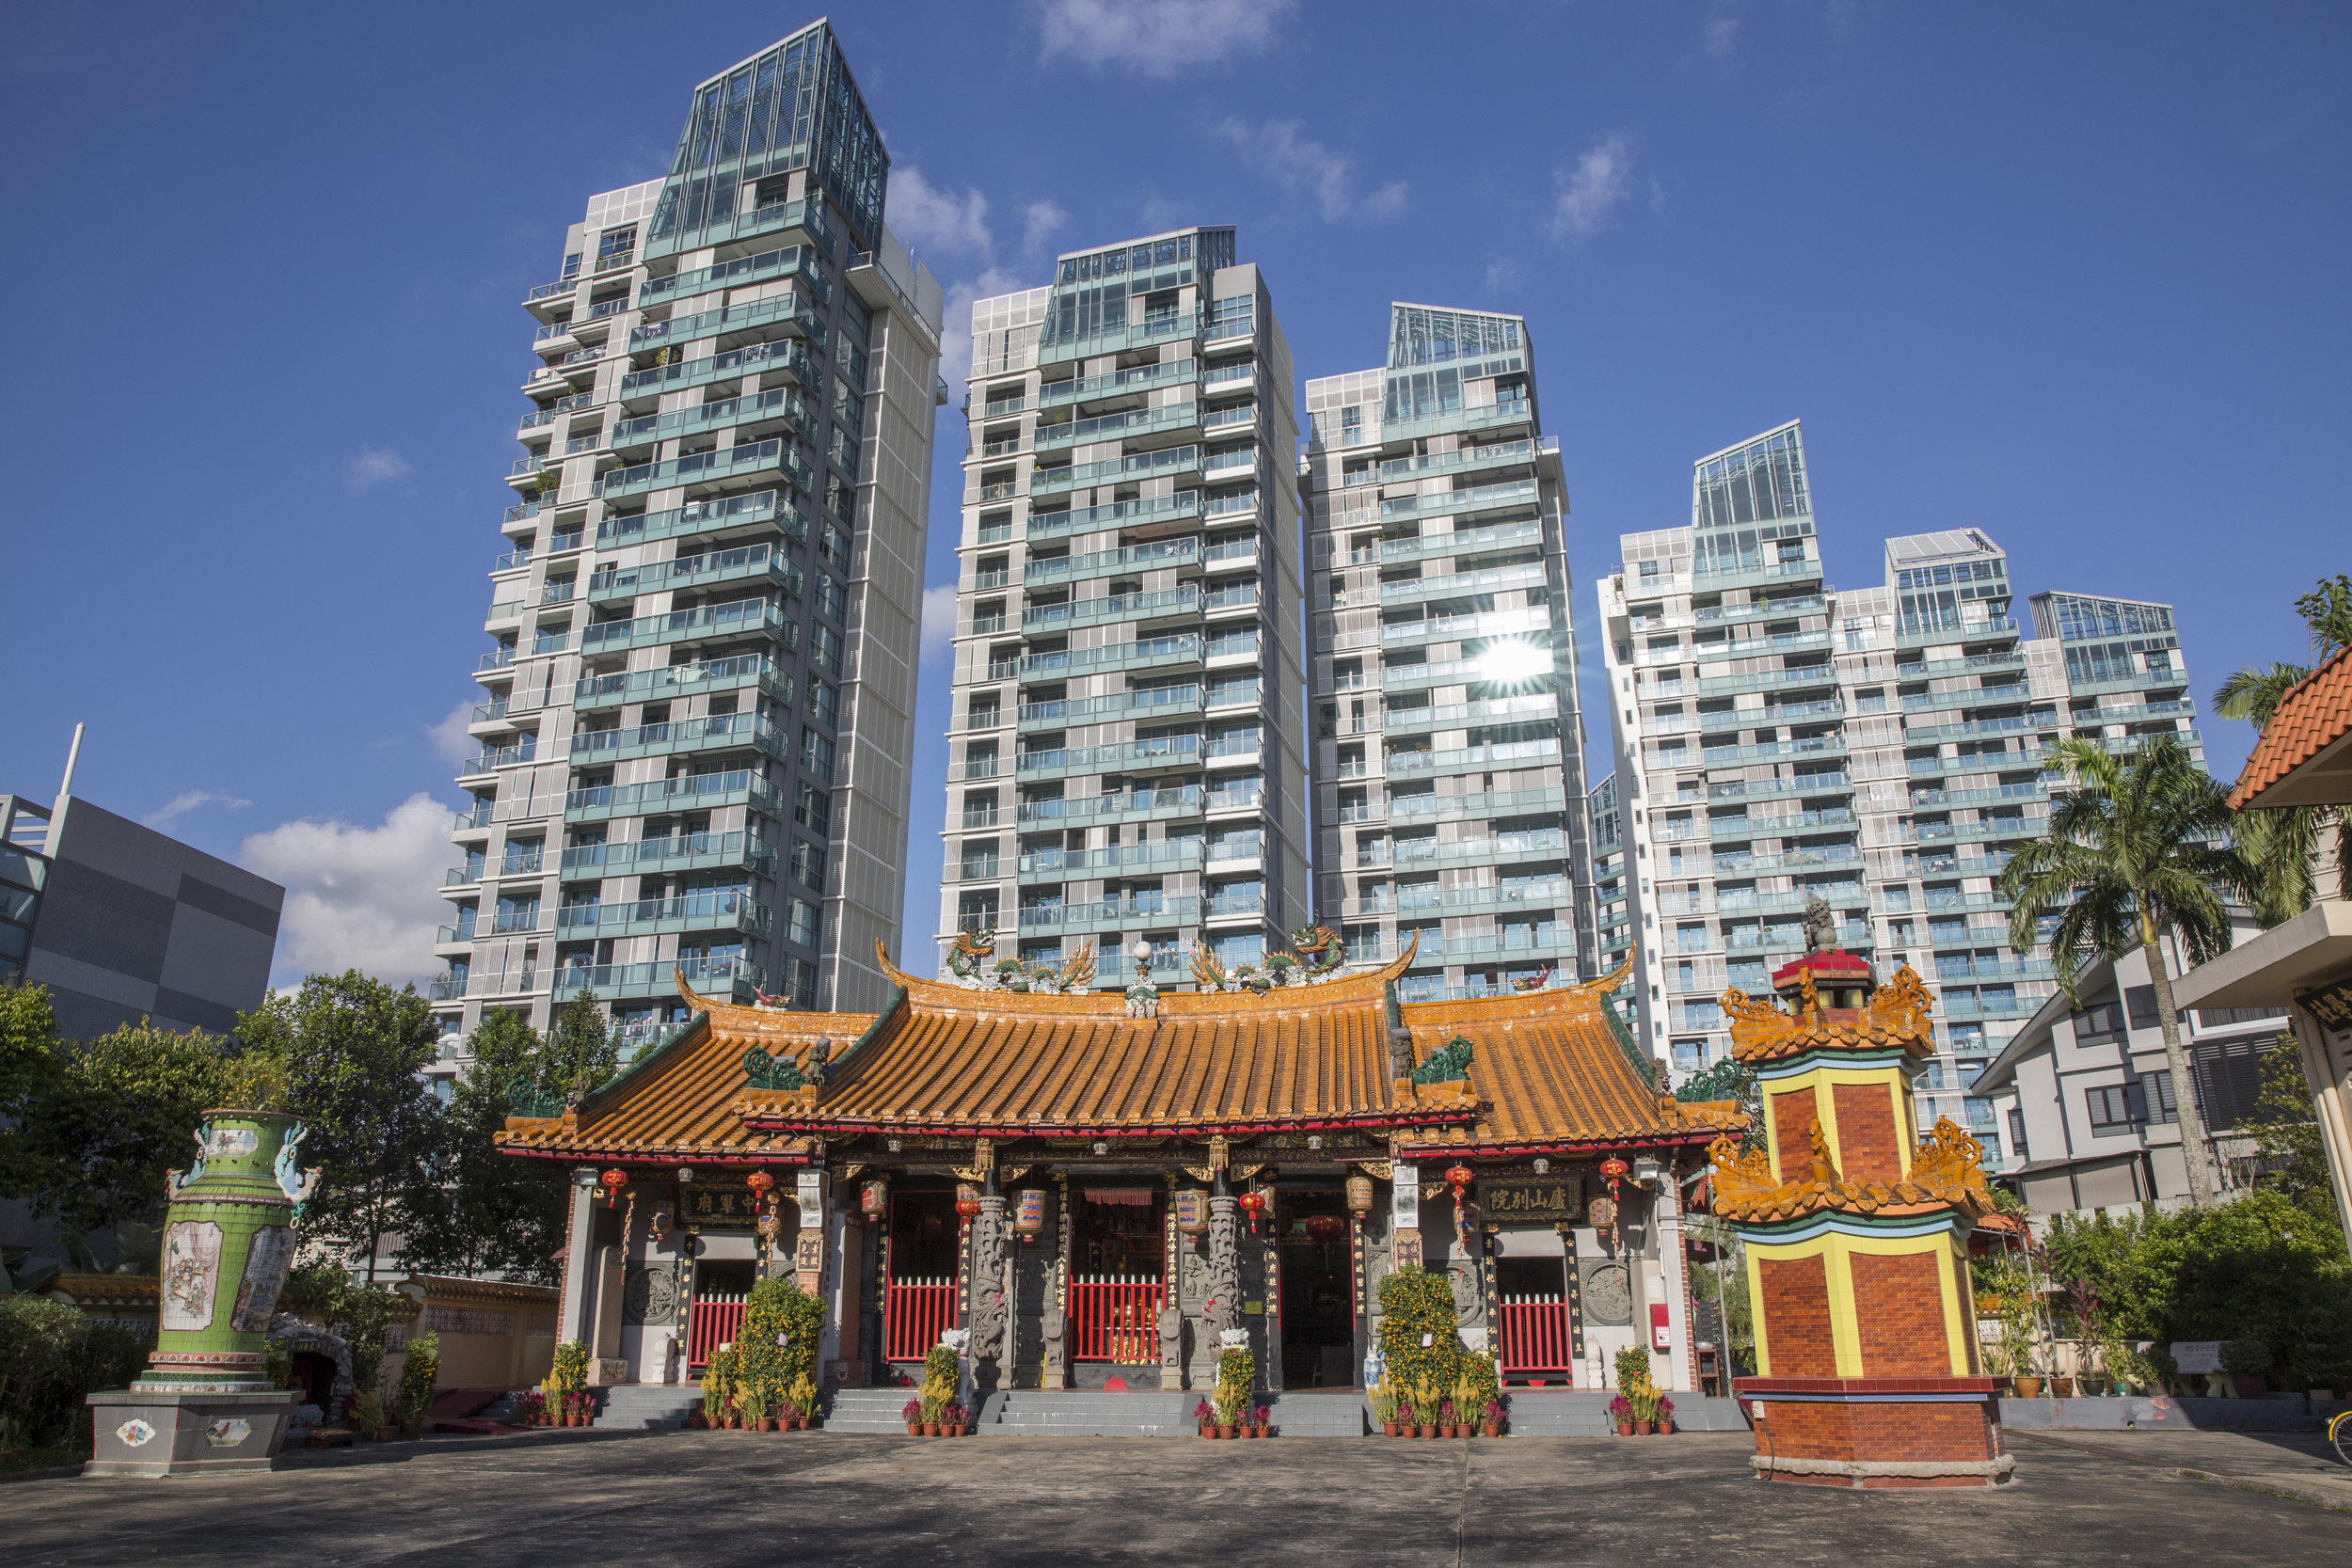 110_Kiew Lee Tong Temple_01.jpg